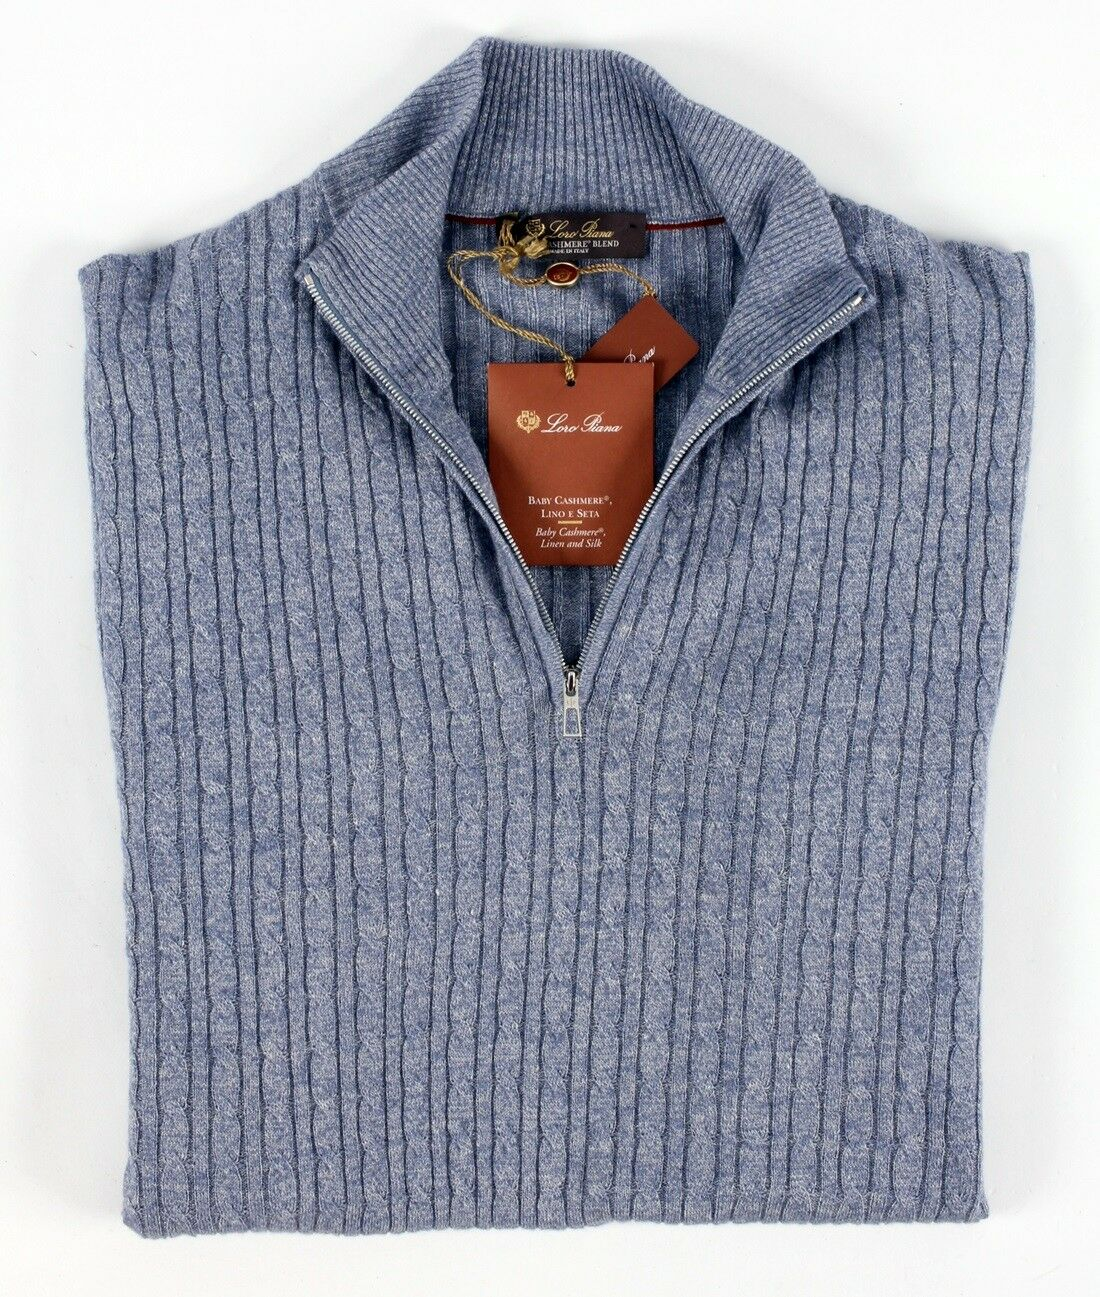 1685 NWT - LORO PIANA BABY CASHMERE BLEND 1/2 Zip Cableknit Sweater - Blau XL